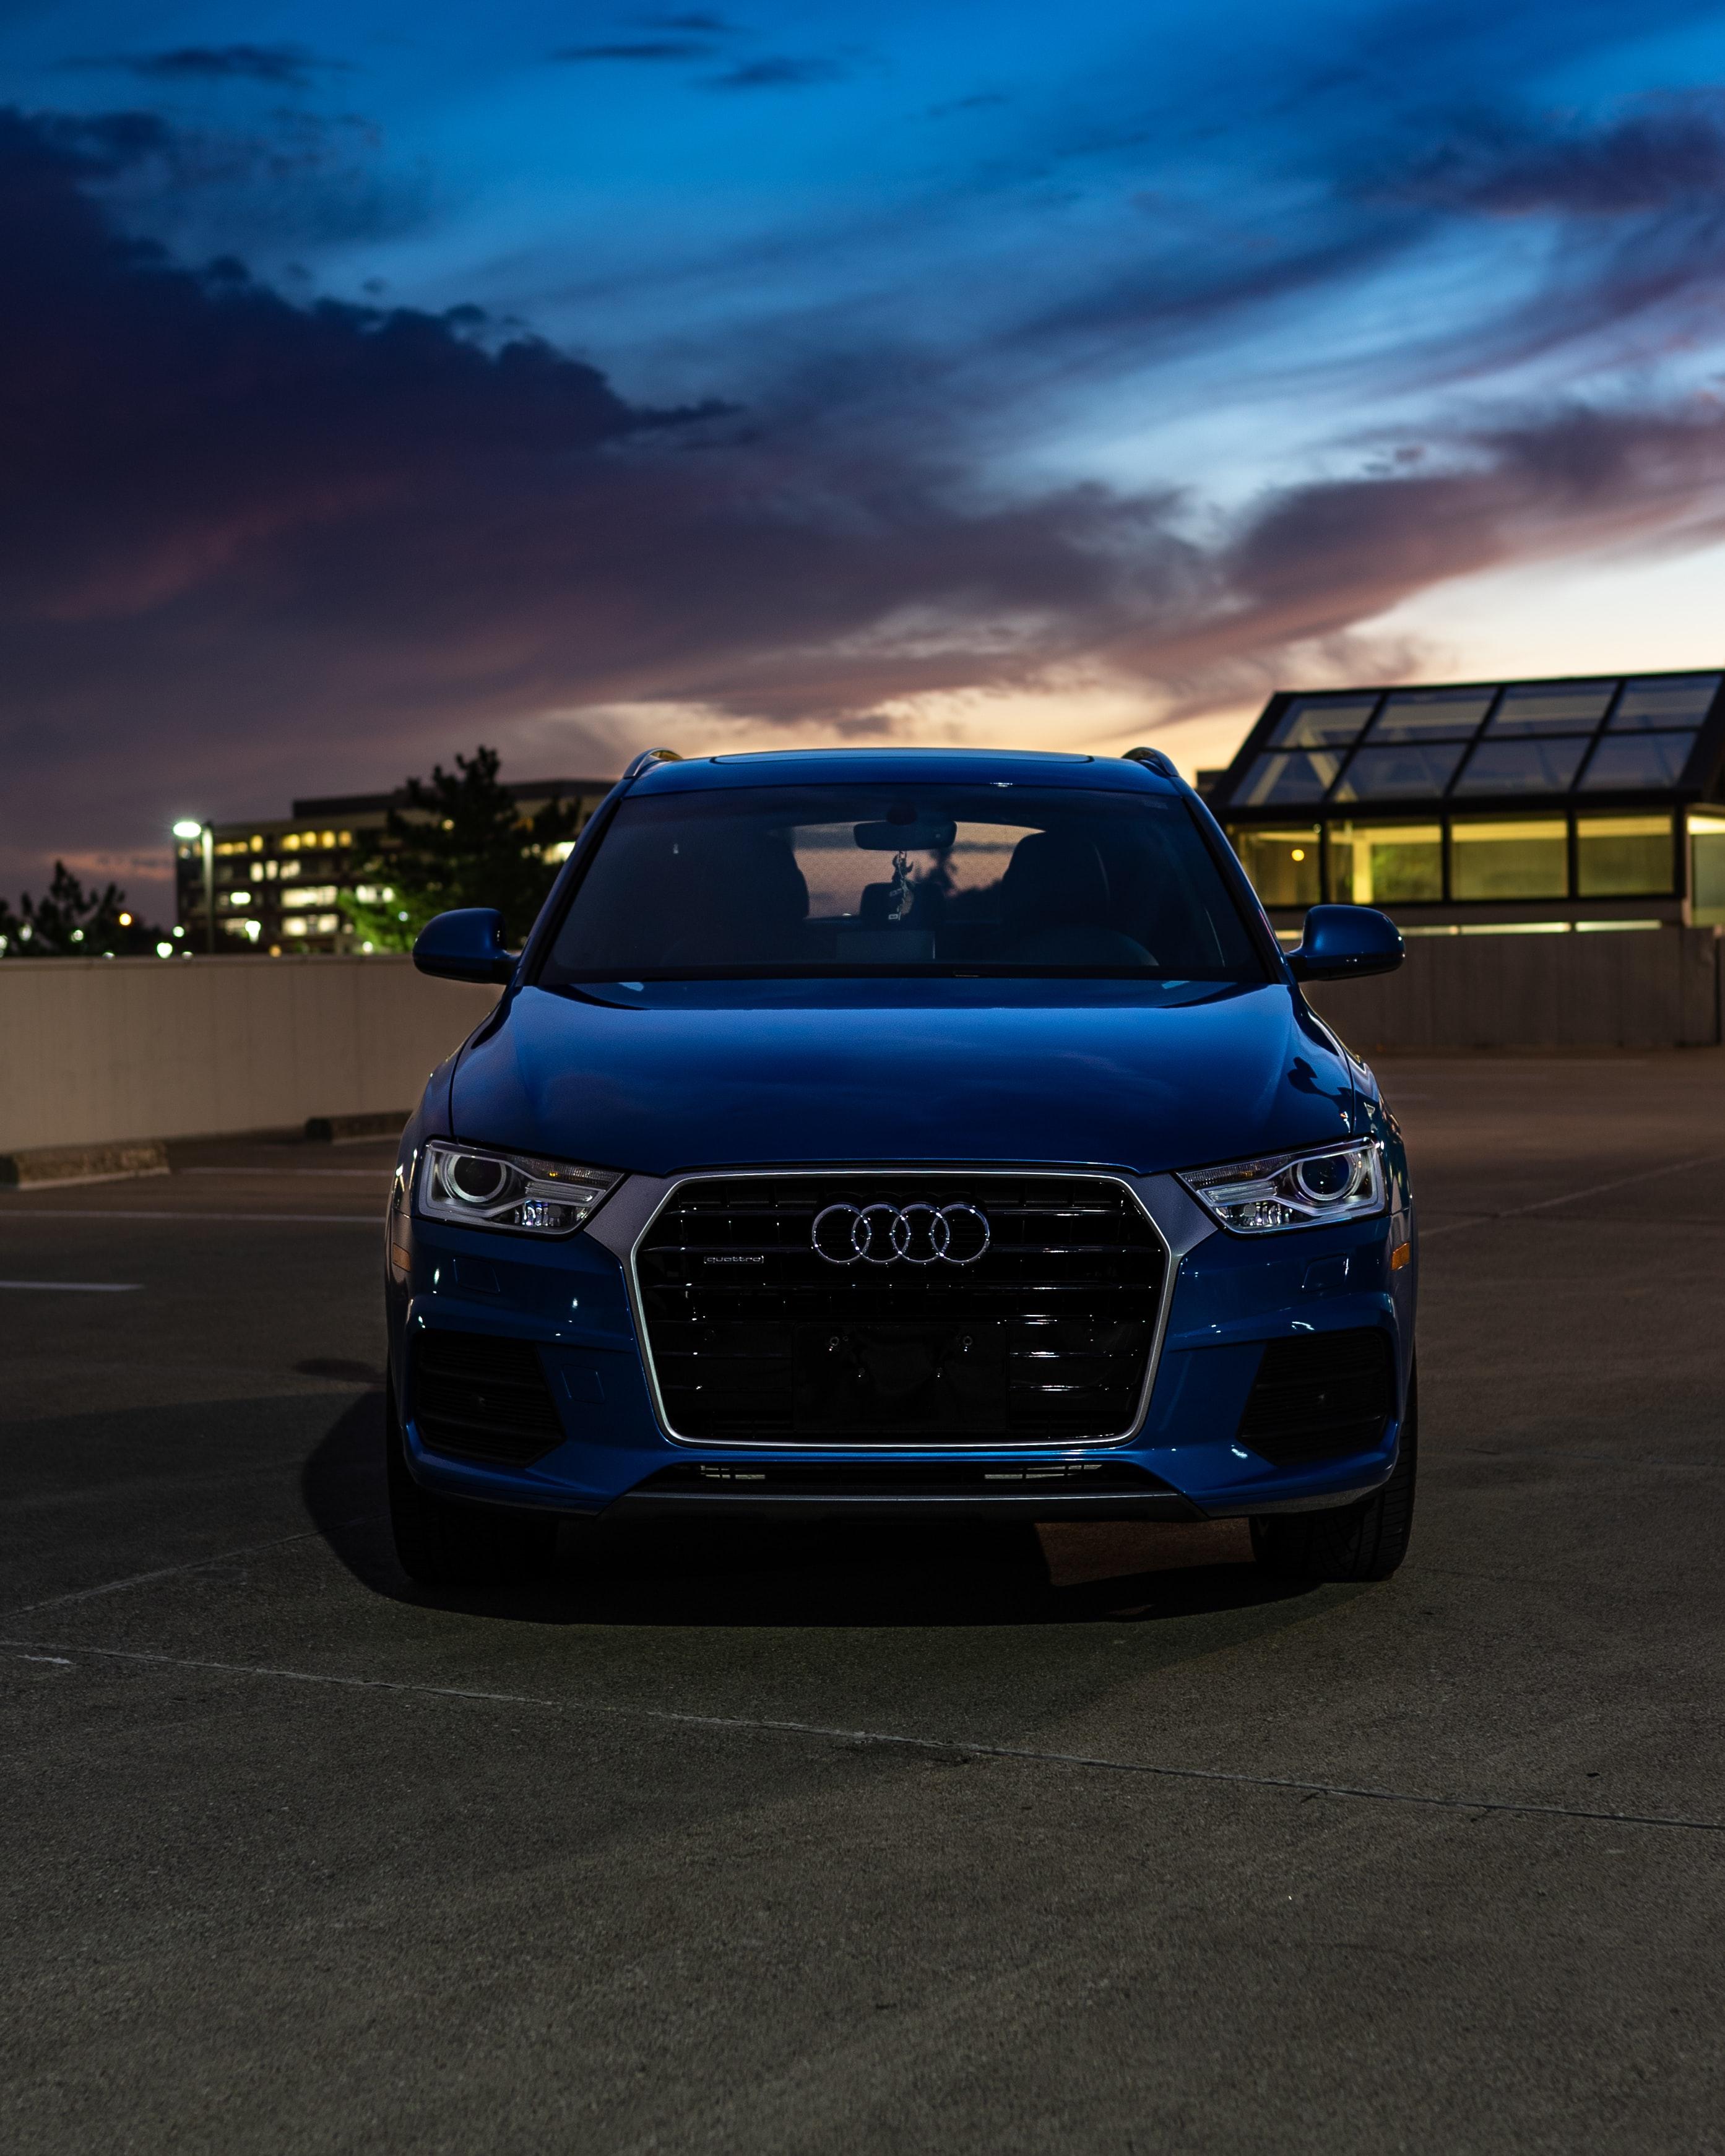 107949 Заставки и Обои Вид Спереди на телефон. Скачать Ауди (Audi), Тачки (Cars), Автомобиль, Синий, Вид Спереди картинки бесплатно